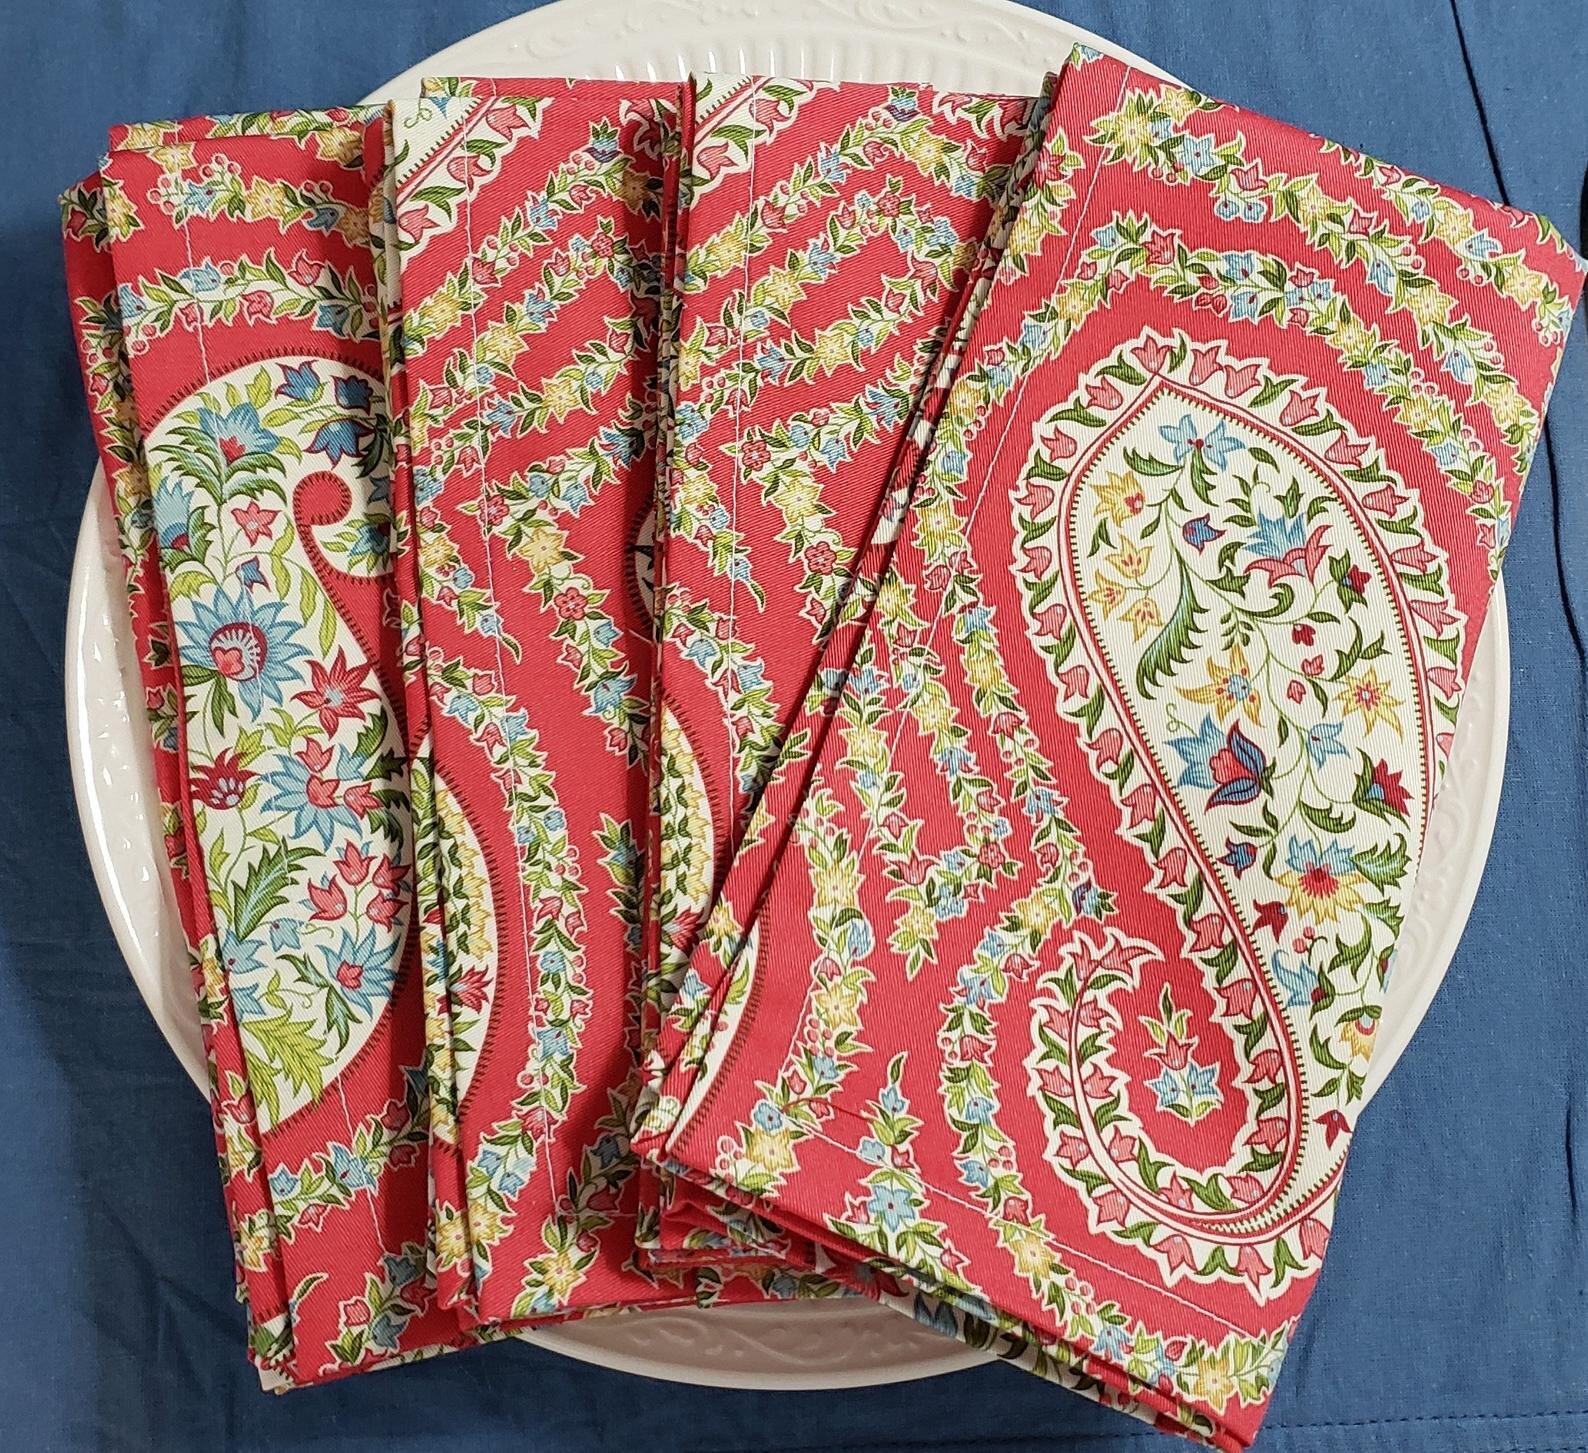 il_1588xN.1968909841_90g2Deep Pink Paisley Cloth Napkins, Set of 4.jpg